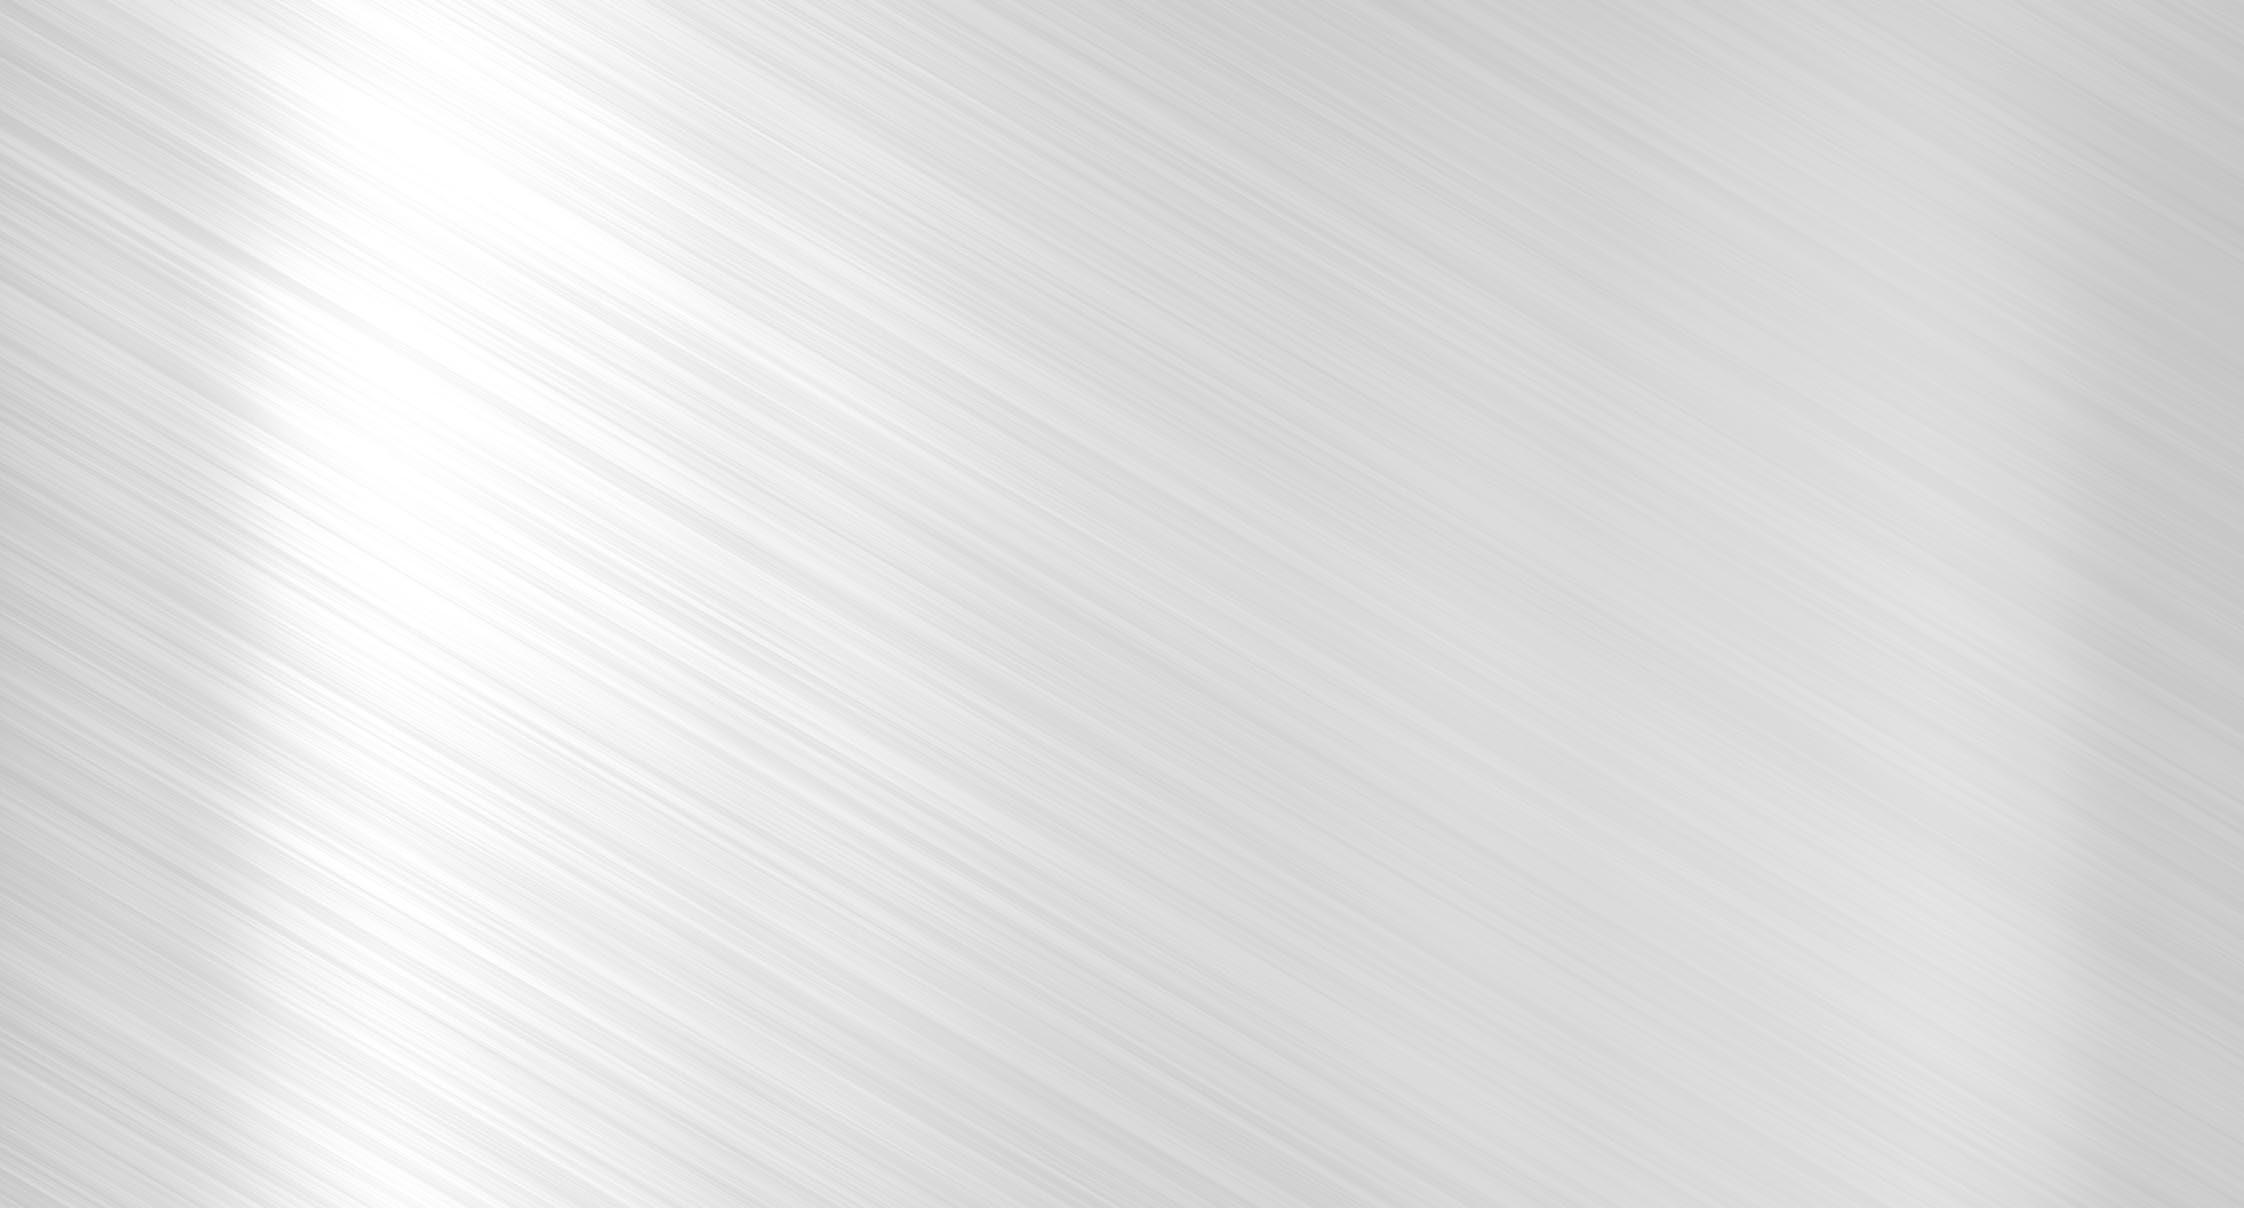 shiny chrome wallpaper 44 images